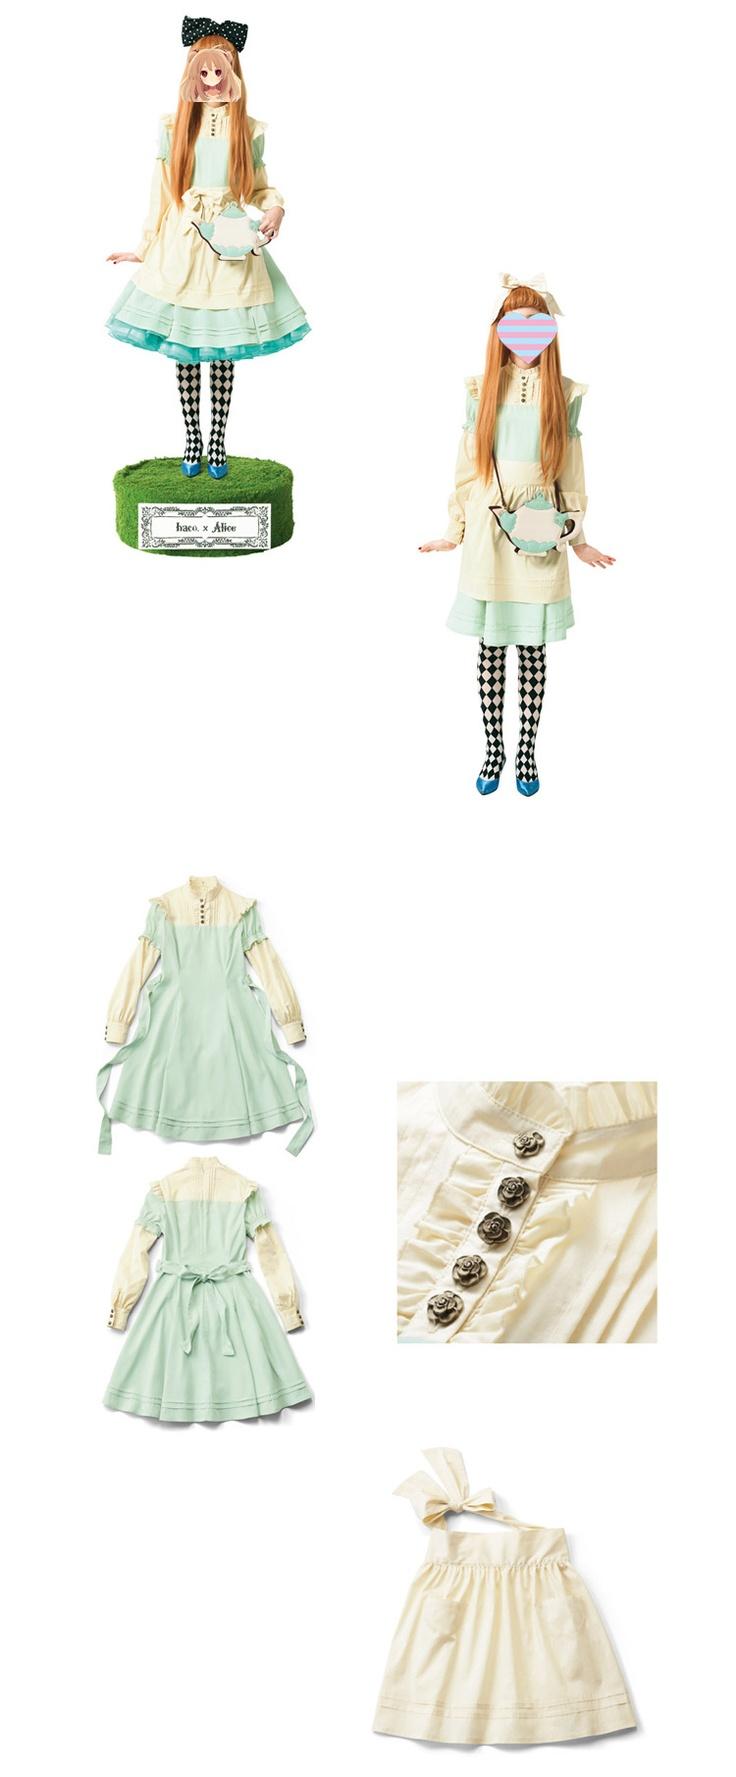 Lolita Alice dress (mysis.taobao)  169 Yuan